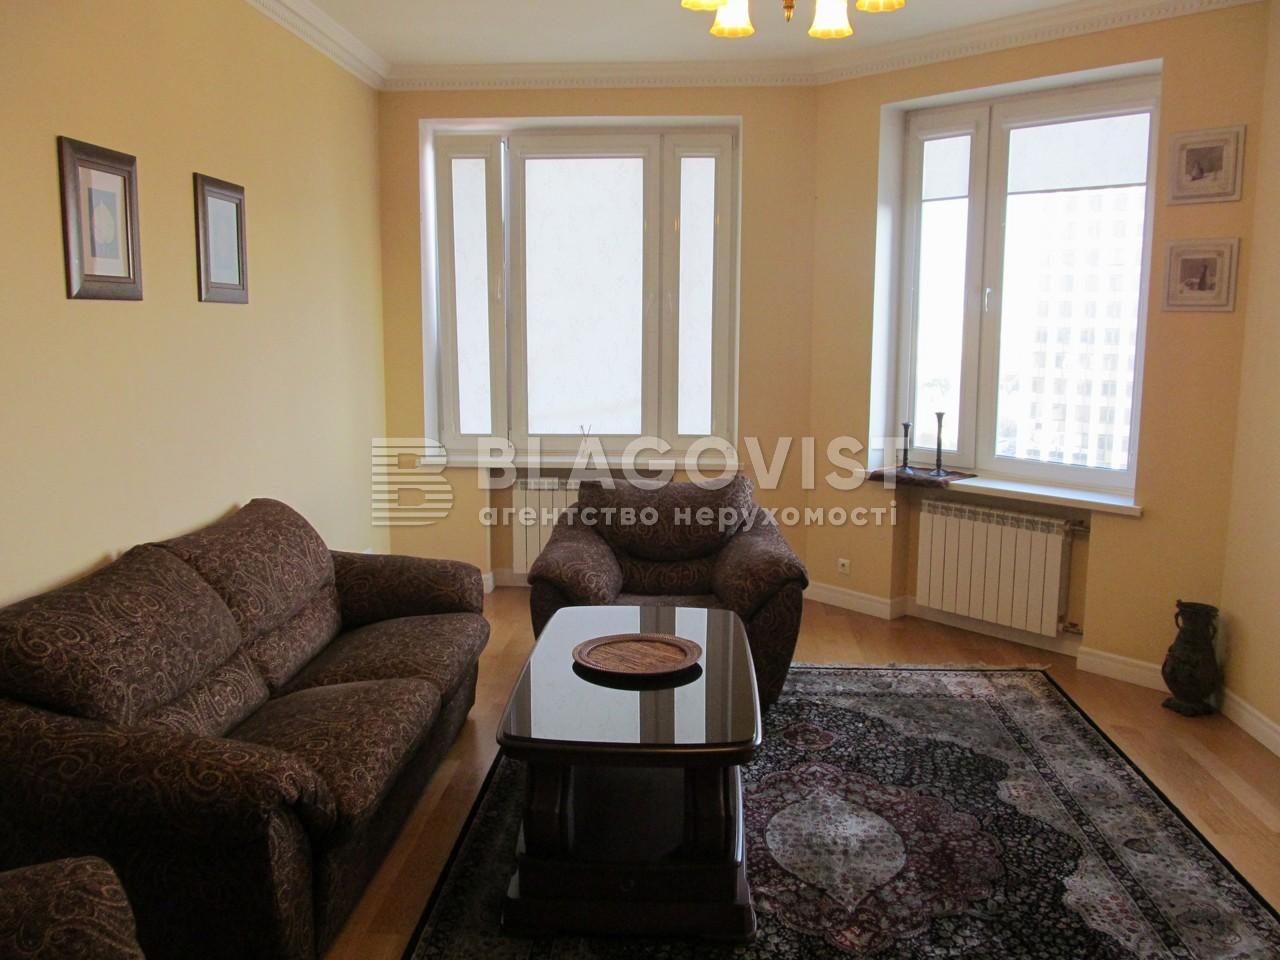 Квартира R-11655, Несторовский пер., 6, Киев - Фото 1